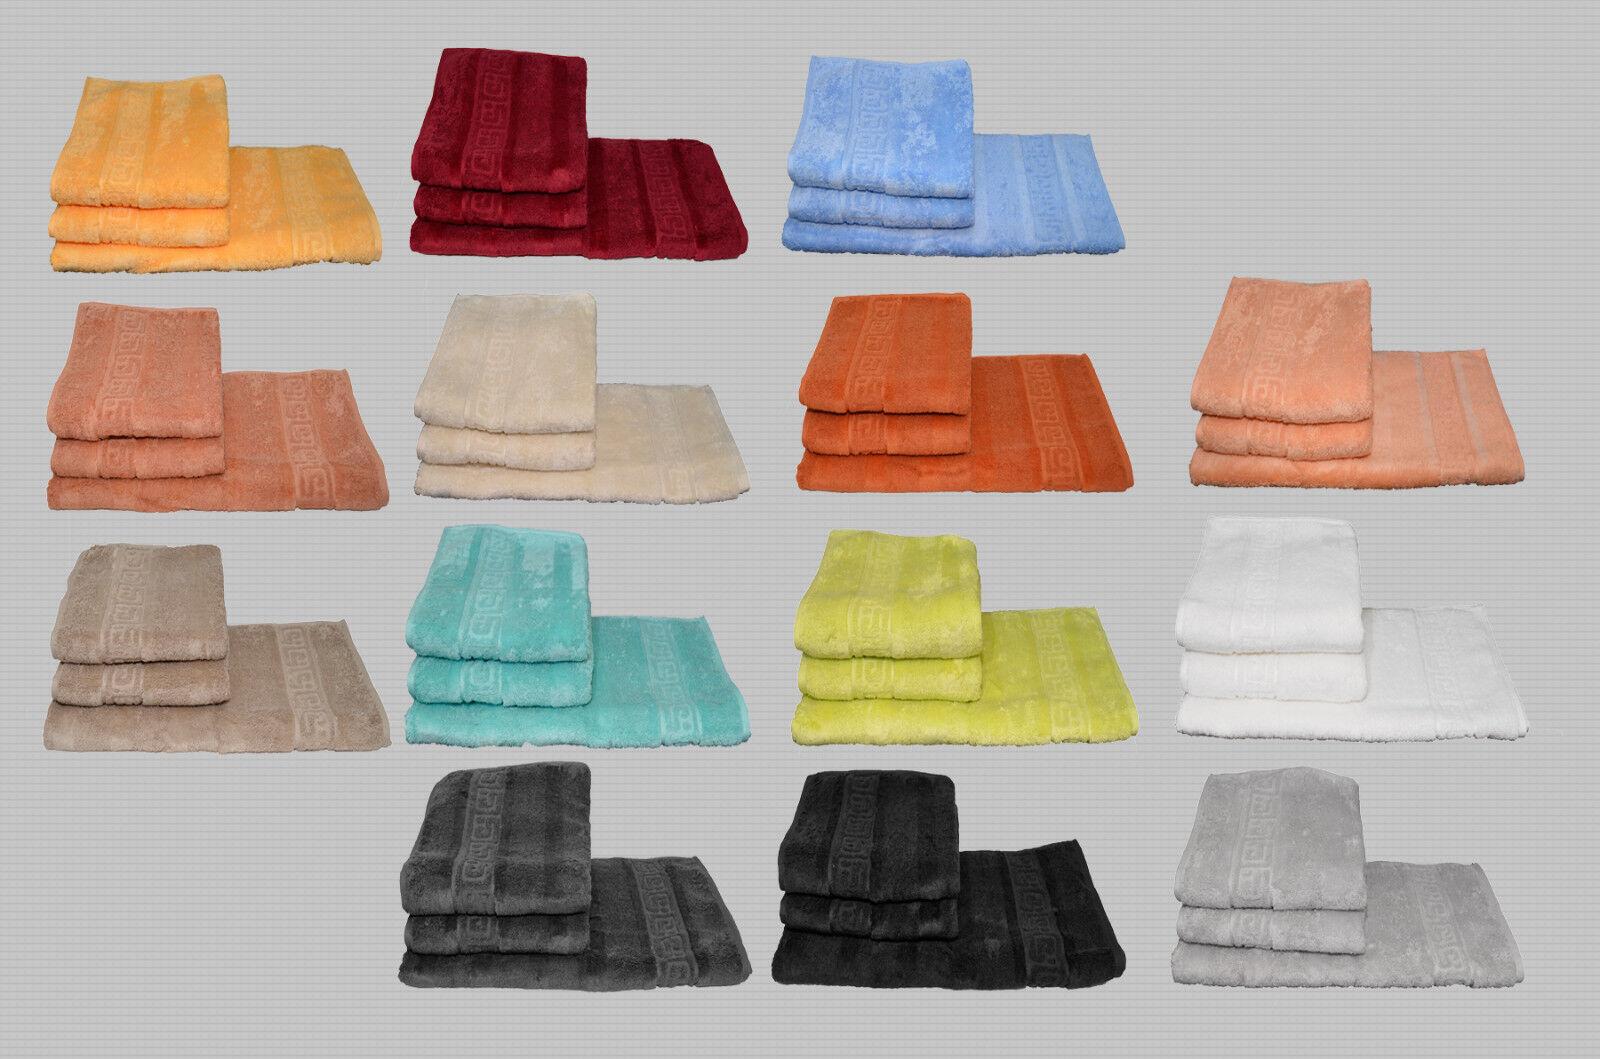 CAWÖ Noblesse Asciugamano Asciugamano Asciugamano 1001 sabbia duschtuch 375 ospiti Panno asciugamani panno Seif f0c443